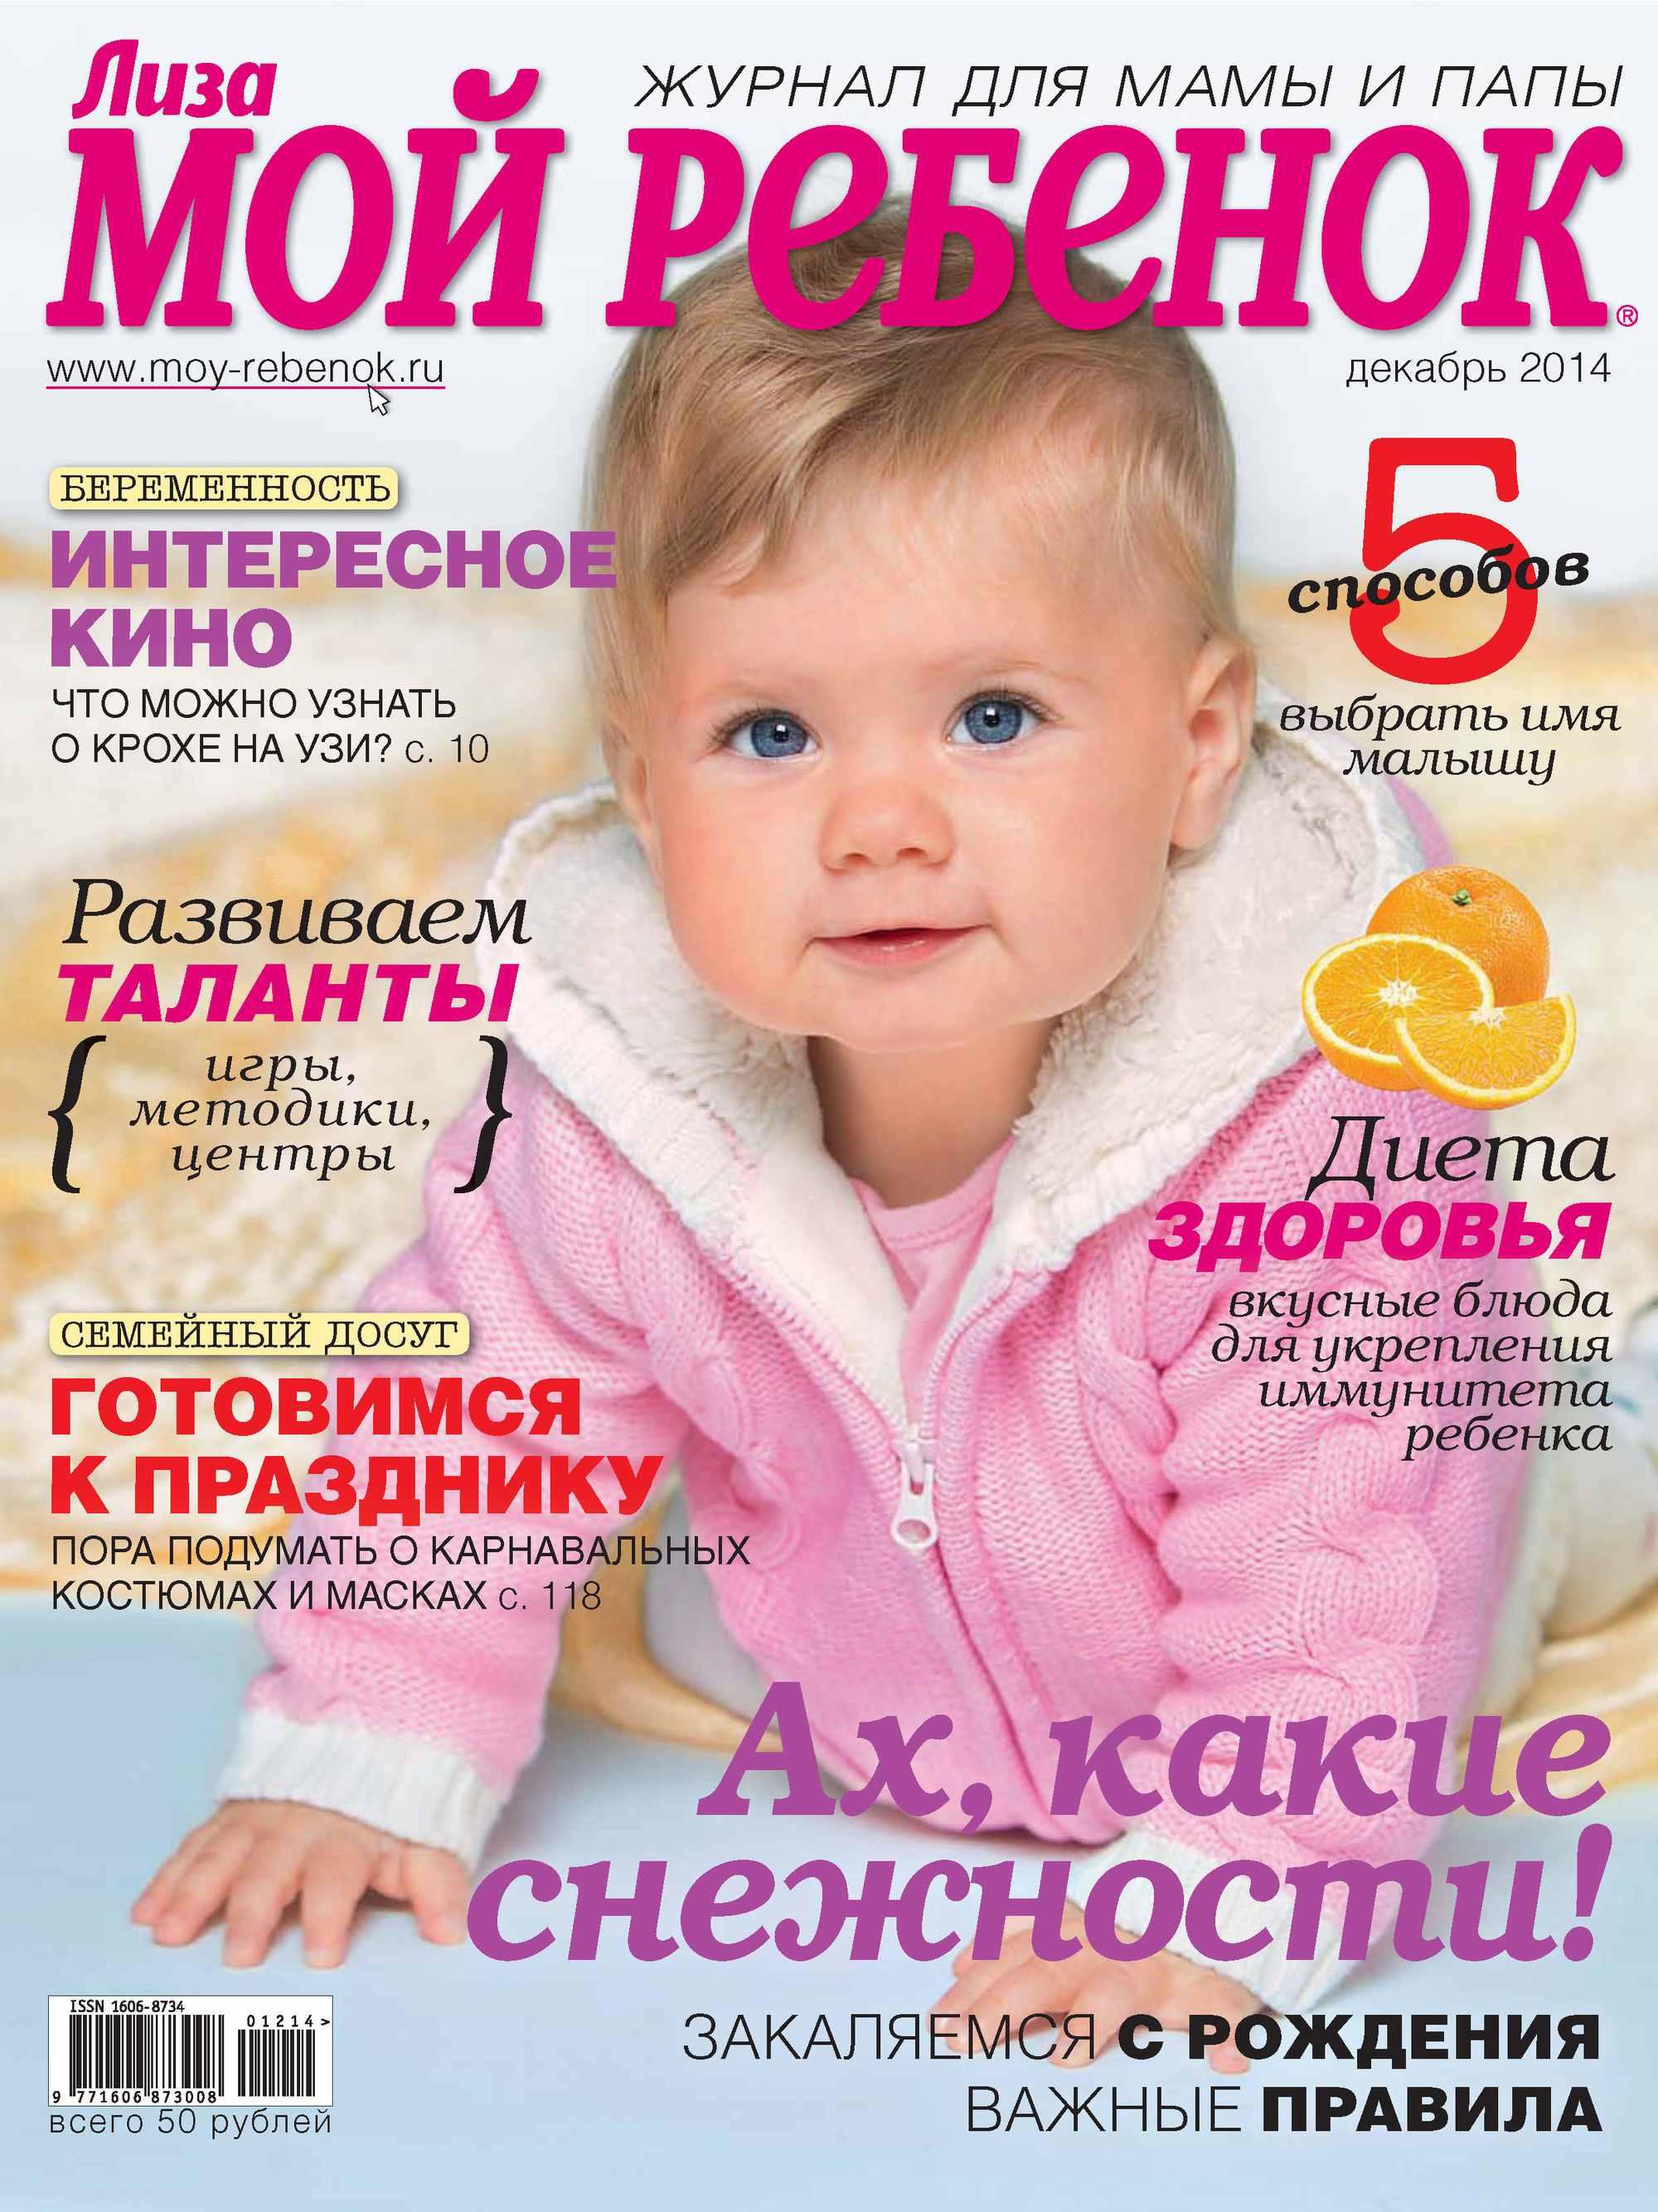 ИД «Бурда» Журнал «Лиза. Мой ребенок» №12/2014 ид бурда журнал лиза мой ребенок 11 2014